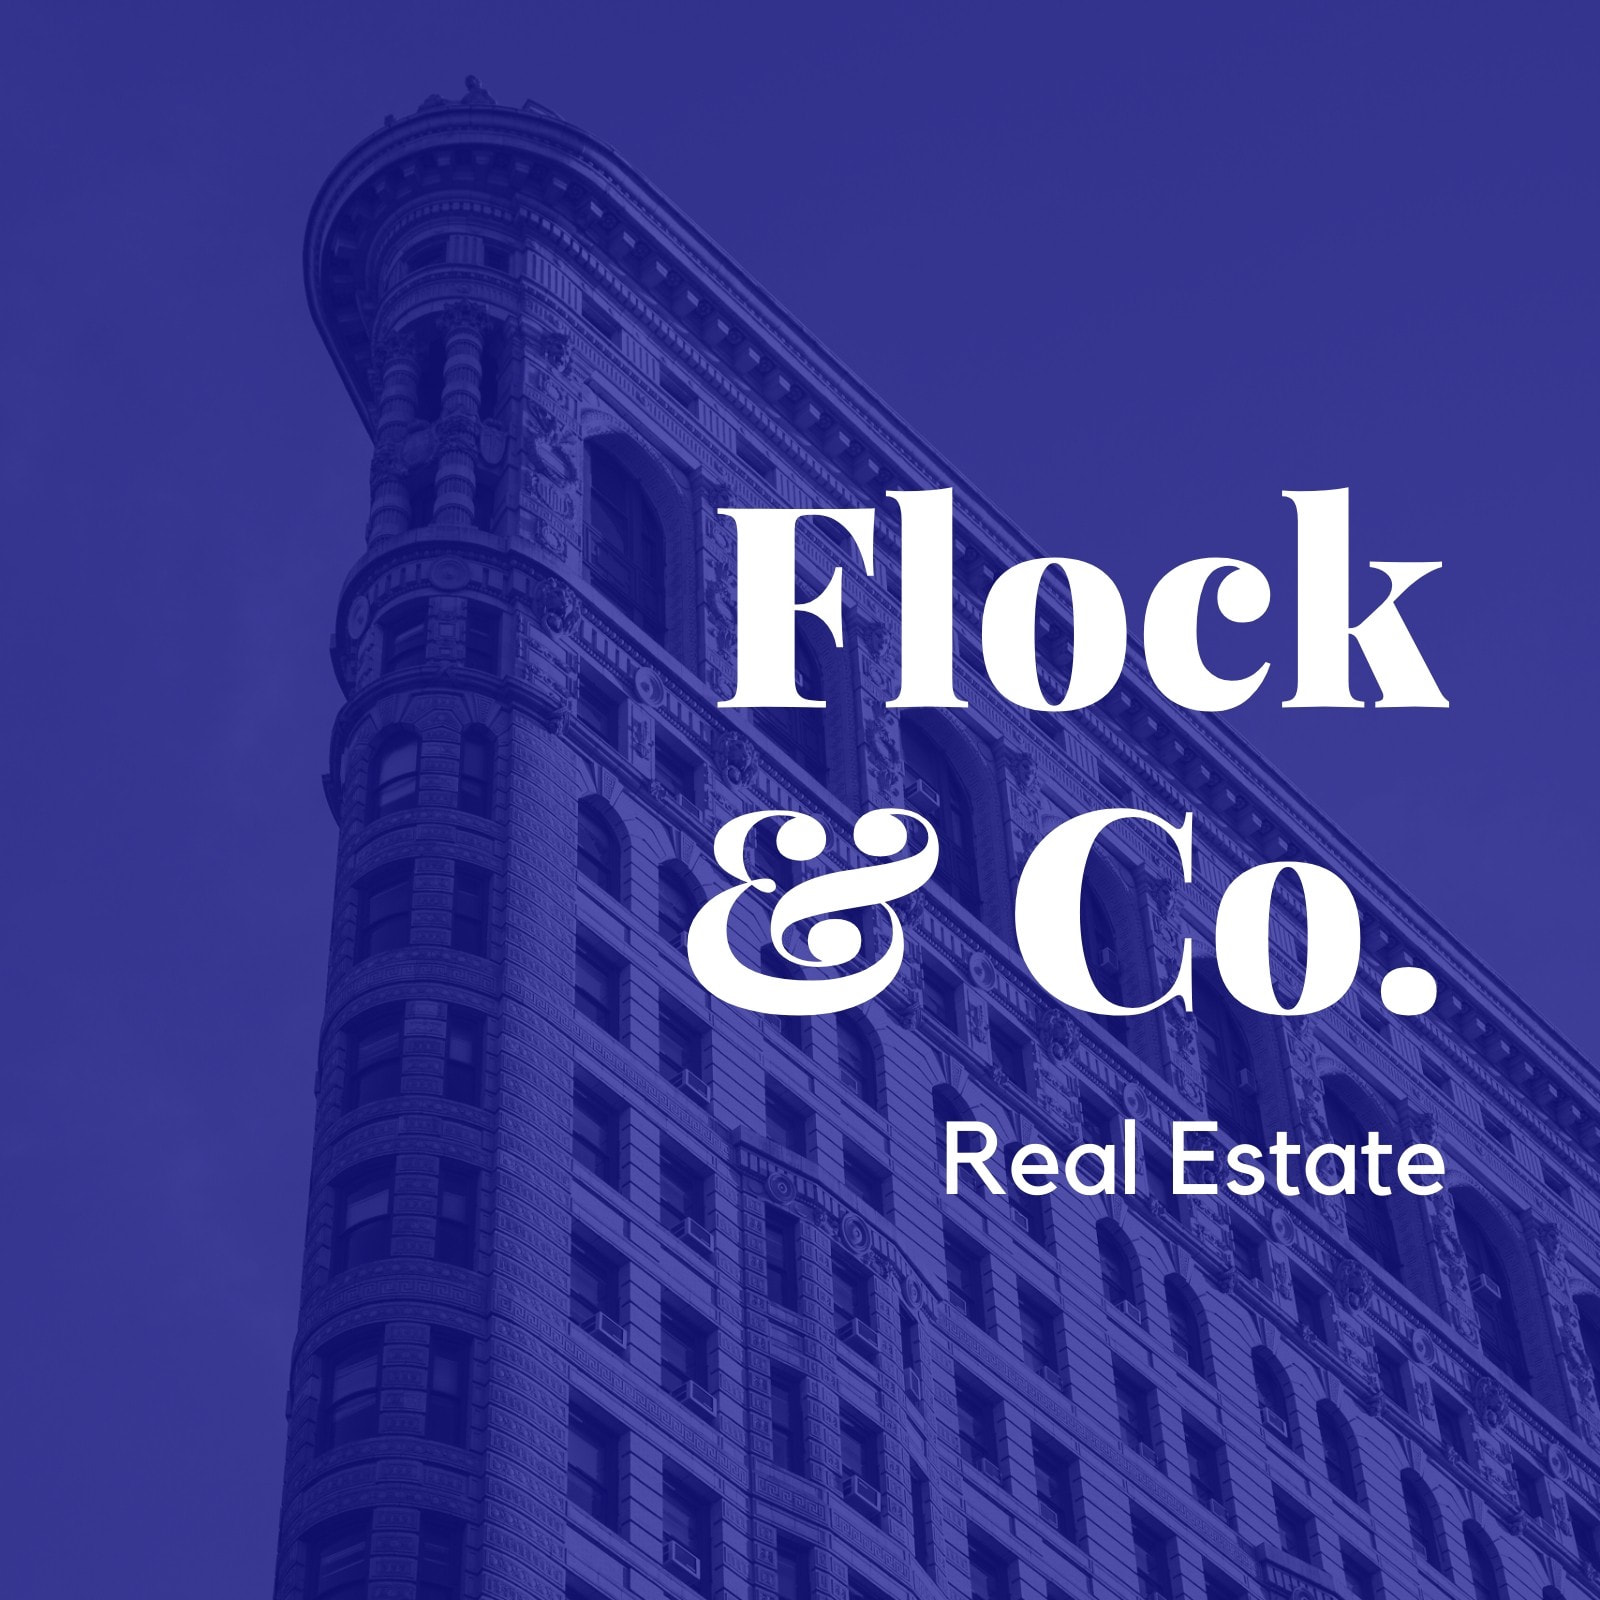 Flock & Co. Blue Building Etsy Shop Icon